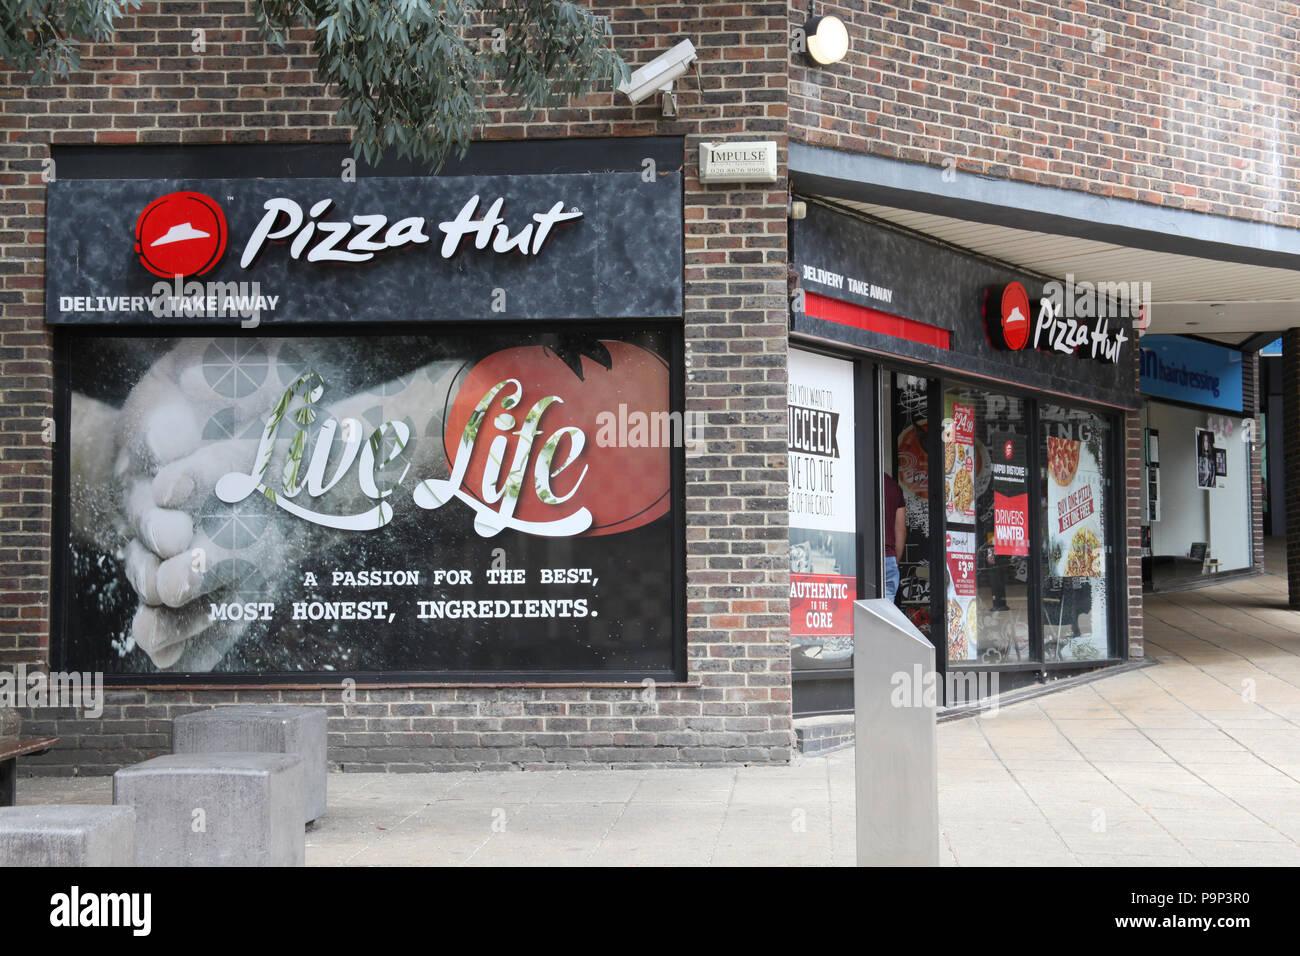 Pizza Hut Uk Stock Photos Pizza Hut Uk Stock Images Alamy